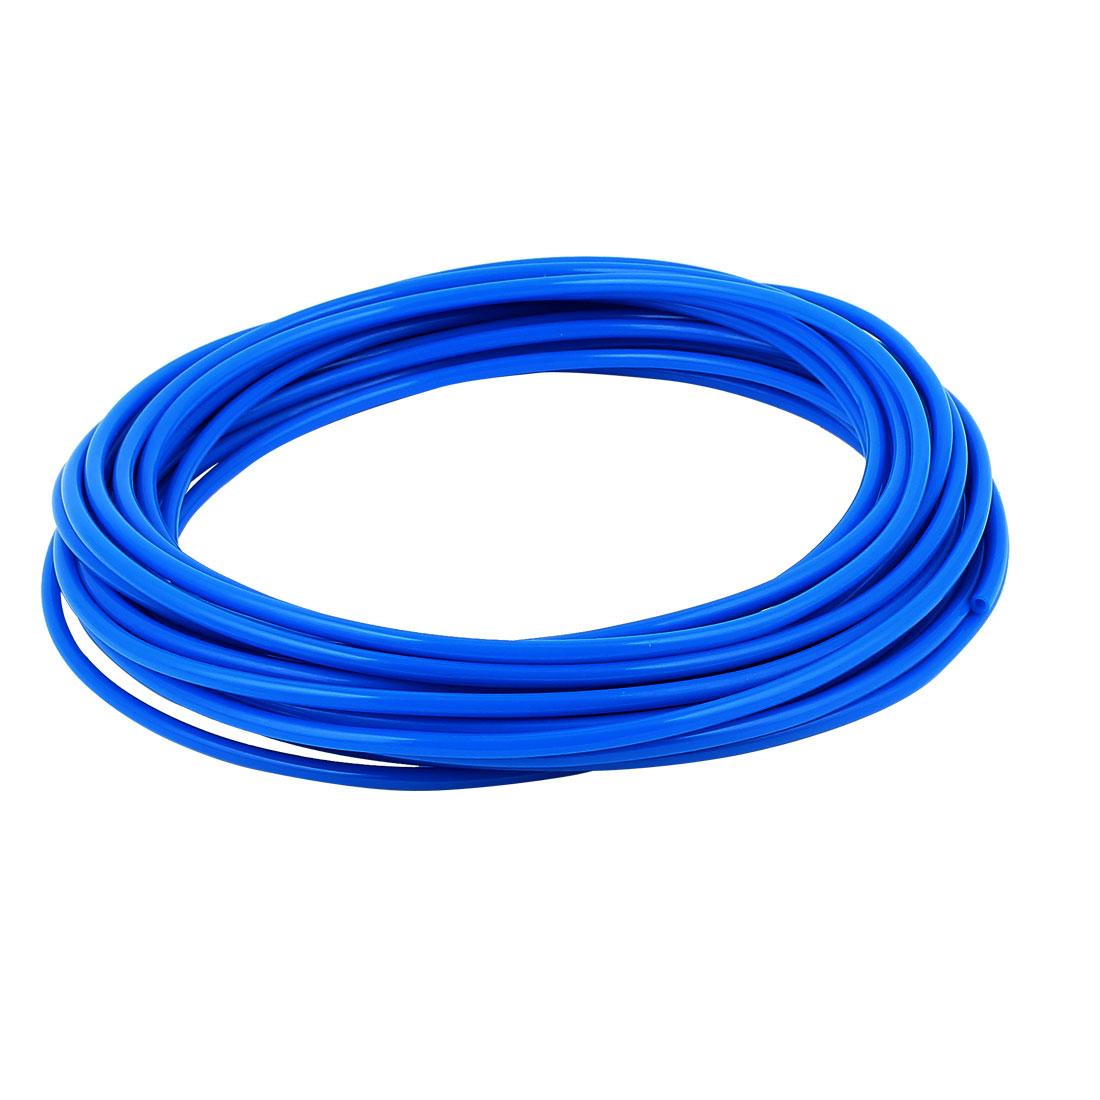 4mm x 2.5mm Fleaxible PU Tube Pneumatic Hose Blue 10M Length